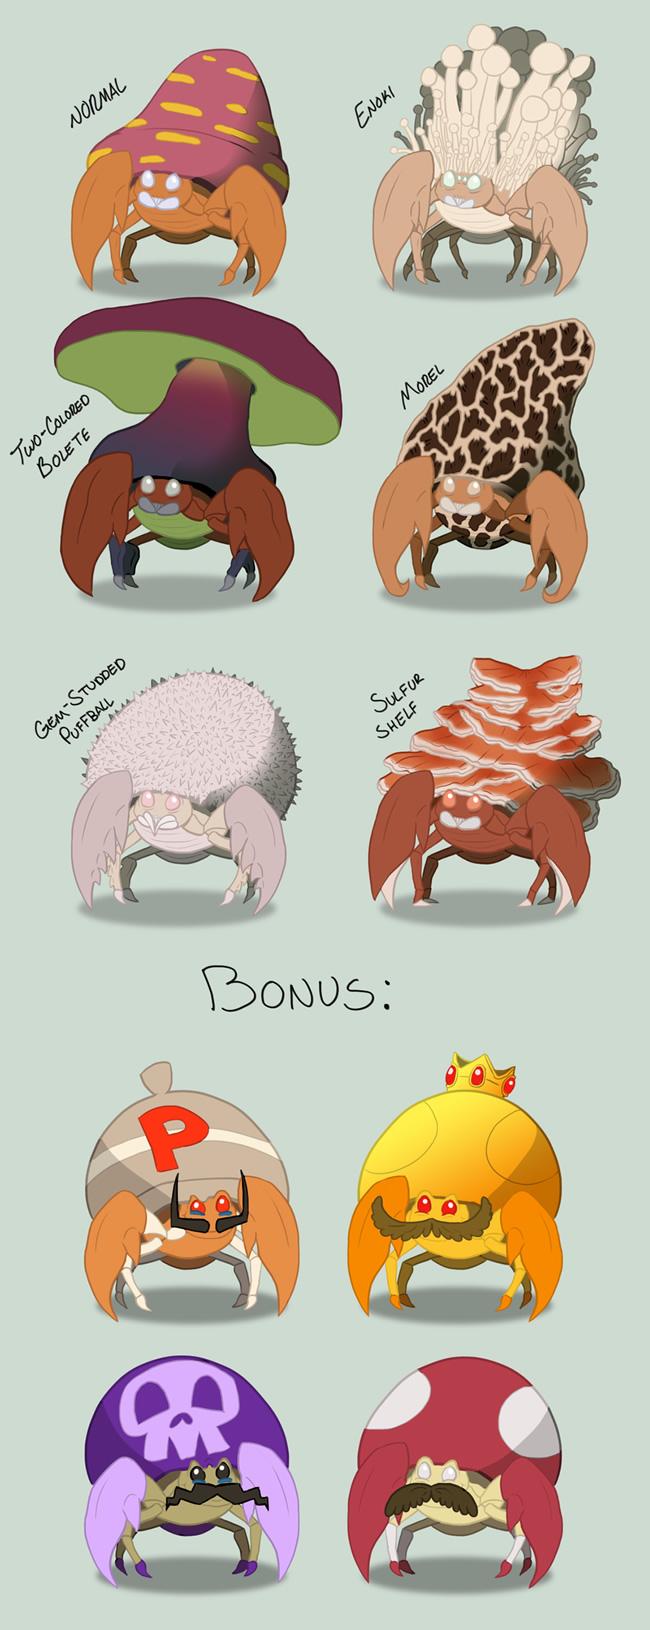 variacoes pokemons especies anime jogo 7